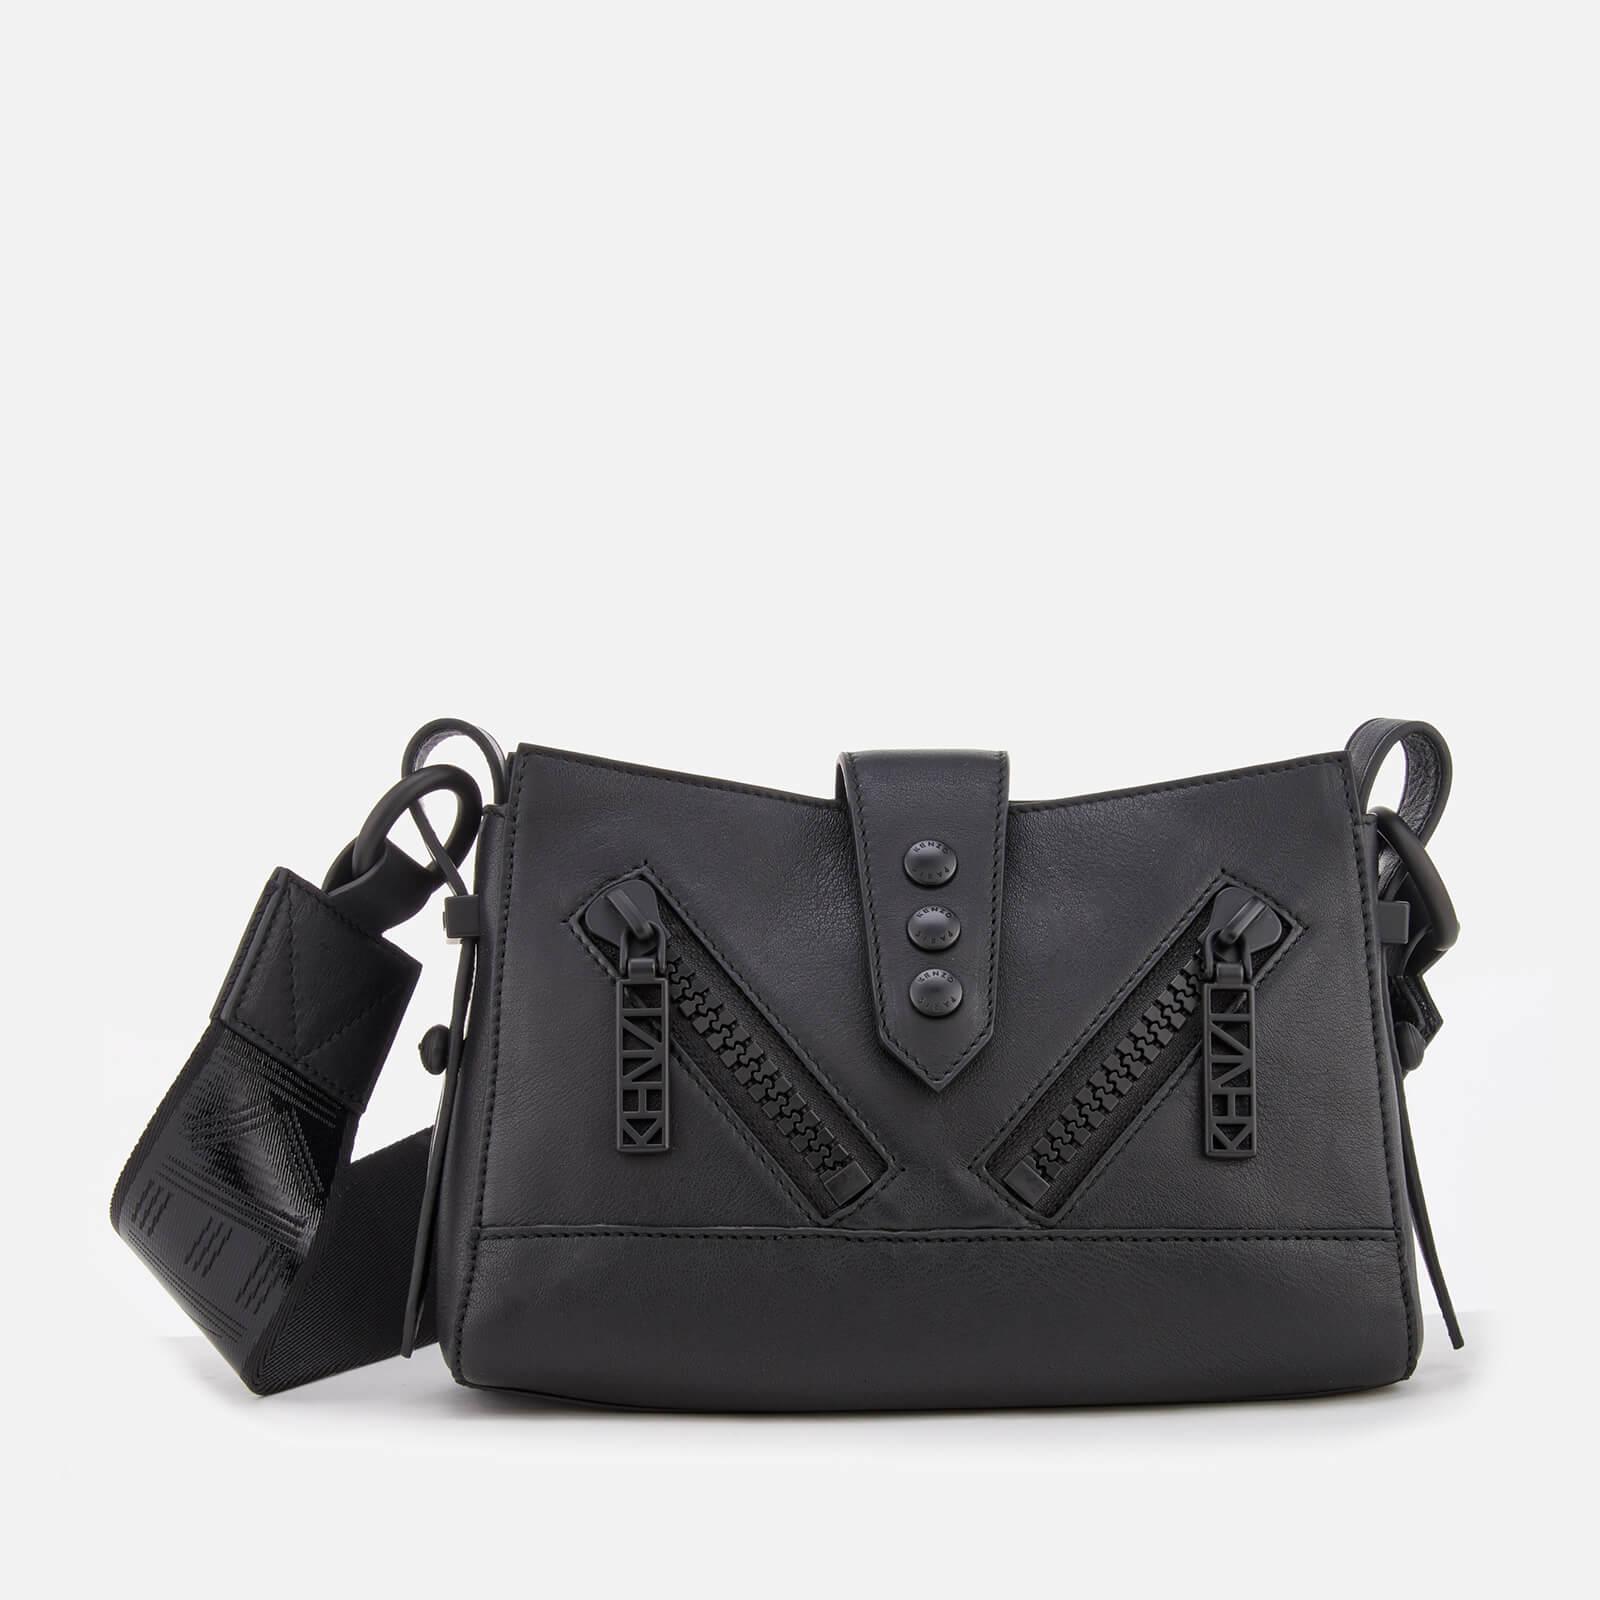 7cc29ea9 KENZO Women's Kalifornia Mini Shoulder Bag - Black - Free UK Delivery over  £50